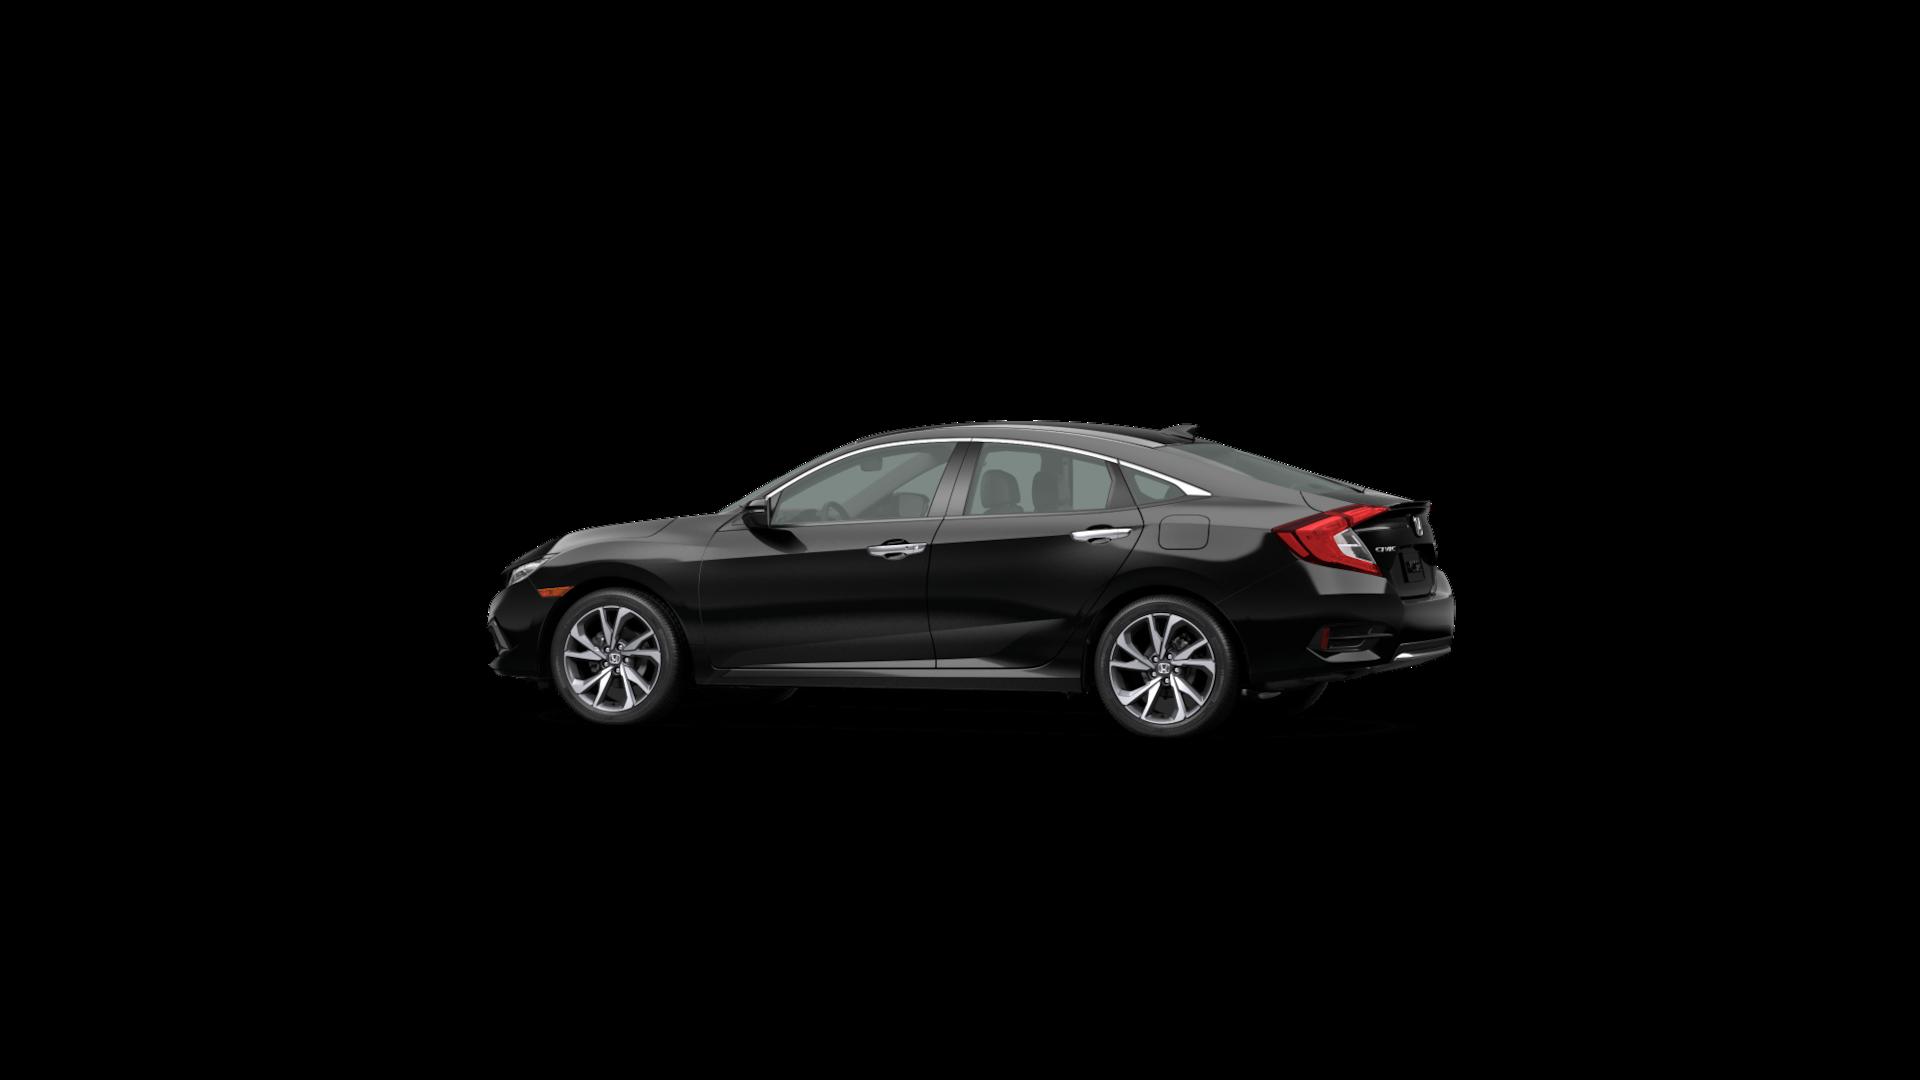 2021 Civic Sedan Sporty Design Honda